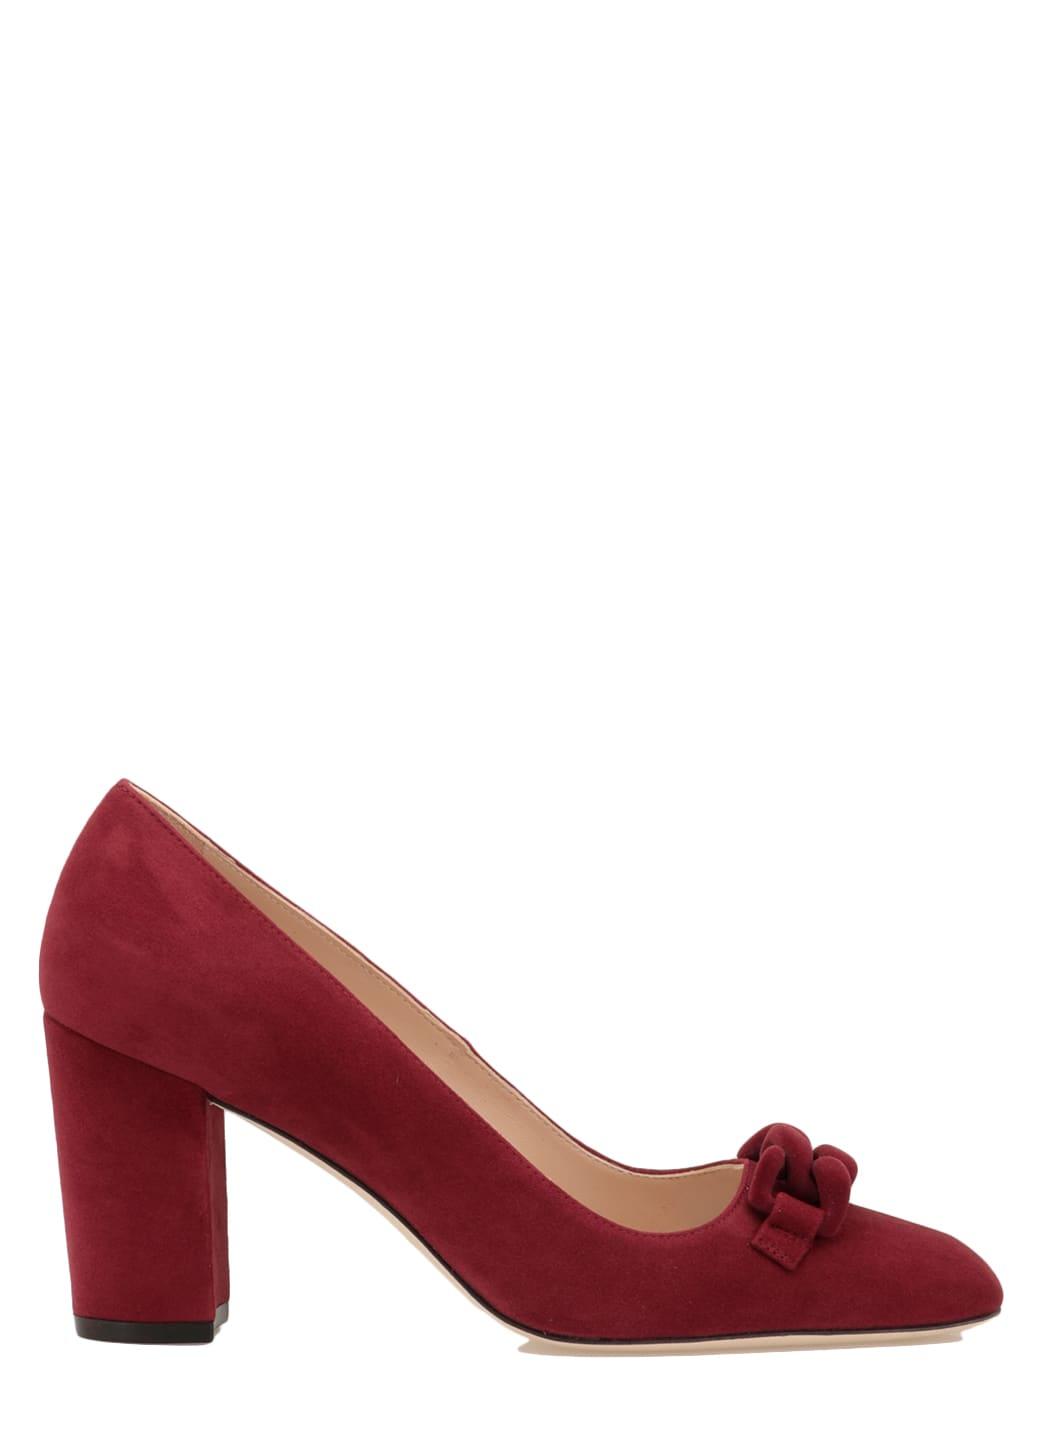 Buy Stuart Weitzman Madison Decollete online, shop Stuart Weitzman shoes with free shipping